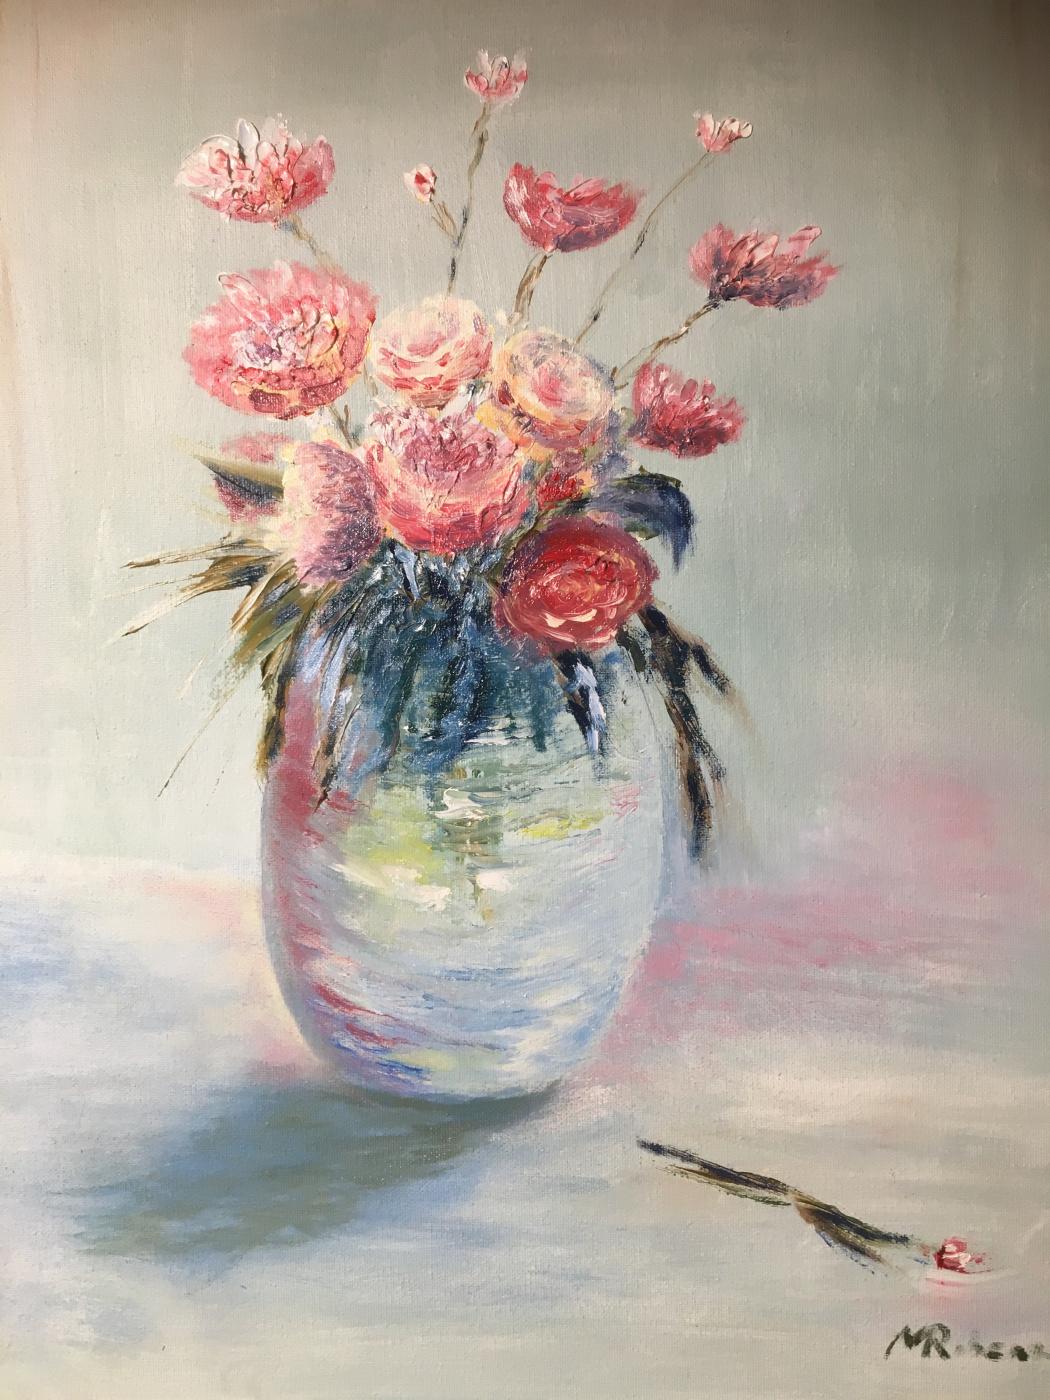 Mihails (Mikhail) Valentinovich Ribenko (Rybenko). Bouquet of flowers in a vase